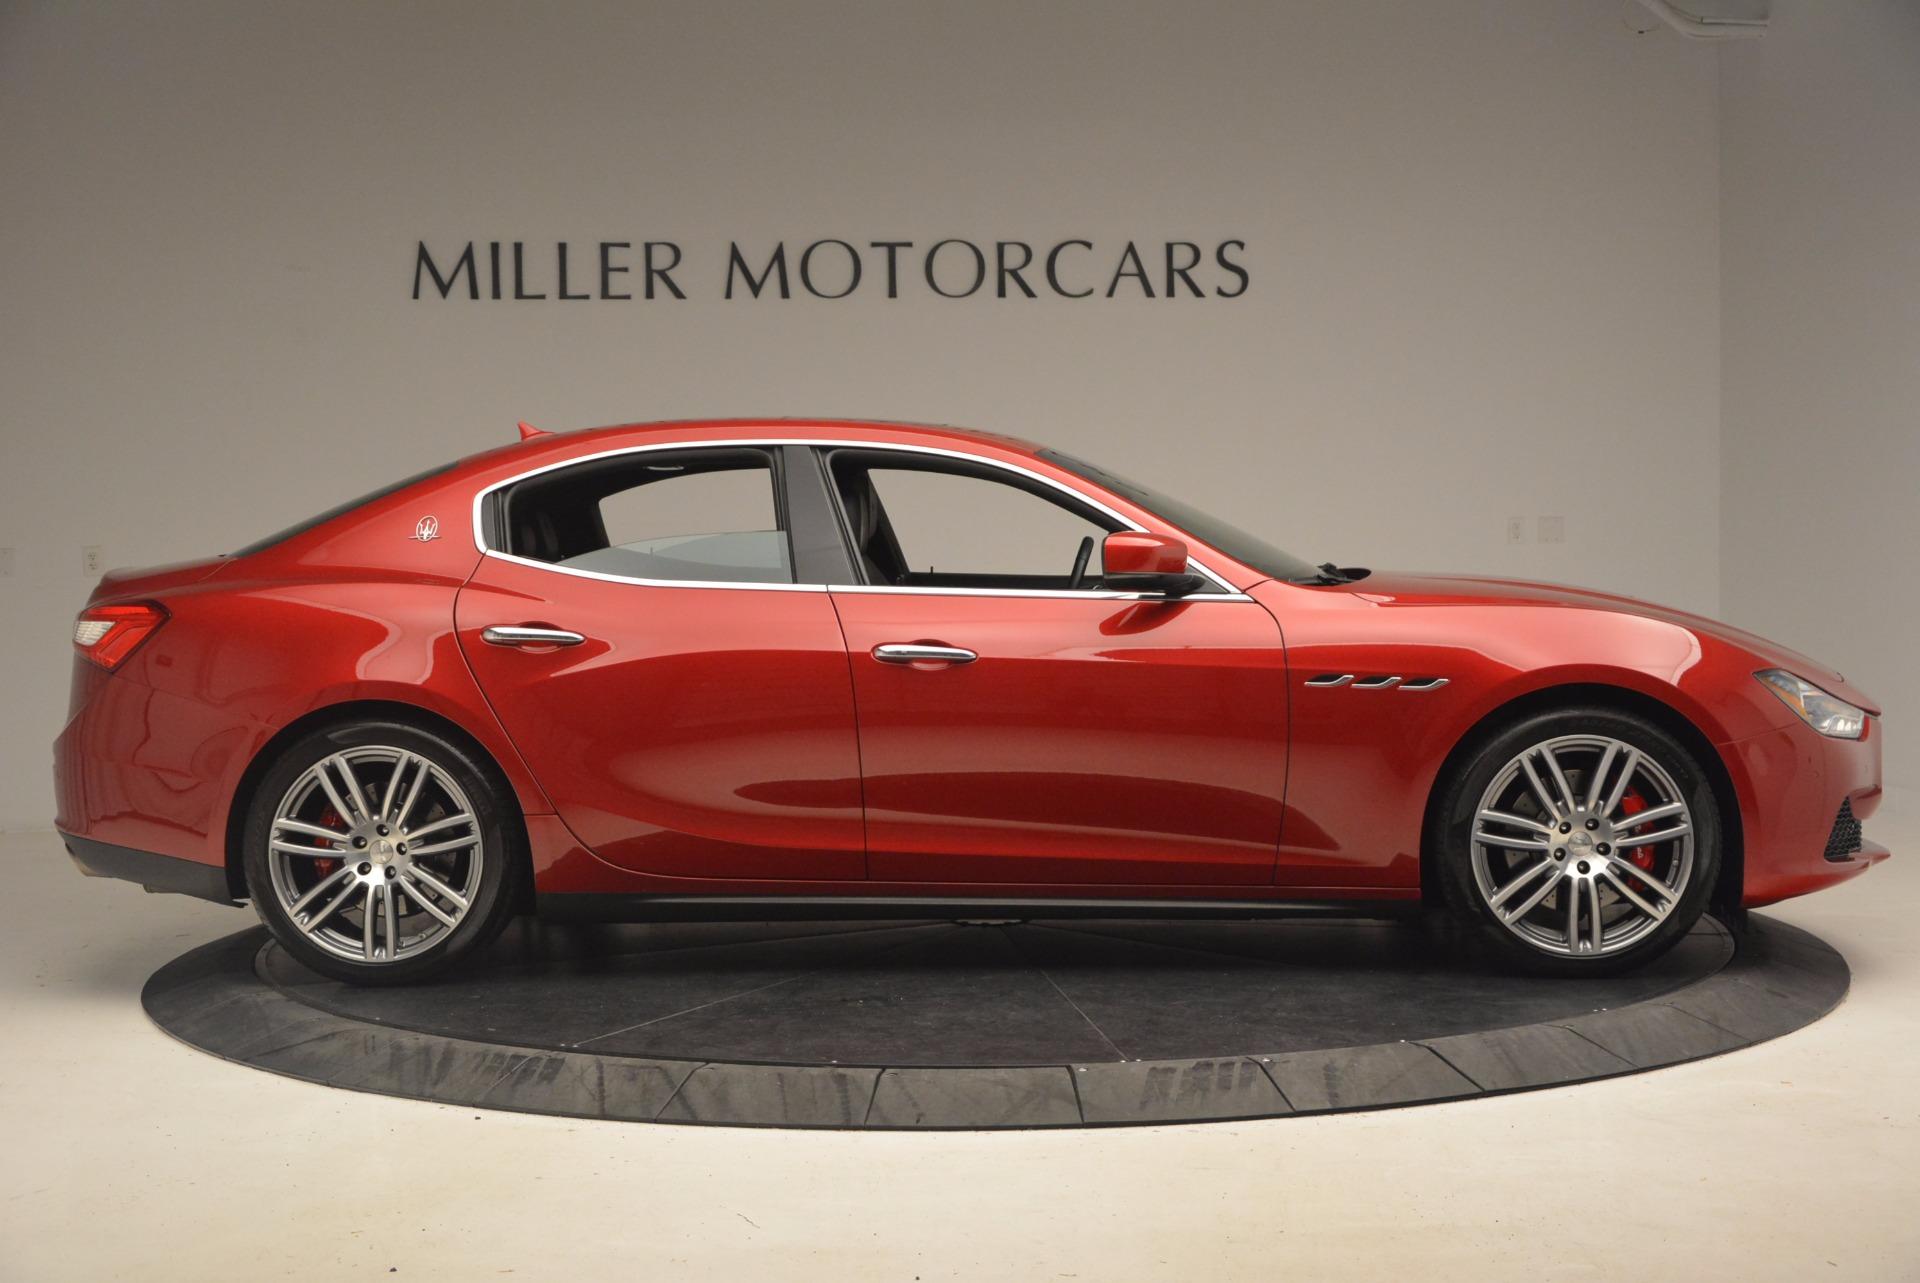 Used 2014 Maserati Ghibli S Q4 For Sale In Greenwich, CT. Alfa Romeo of Greenwich, 7203 1158_p9